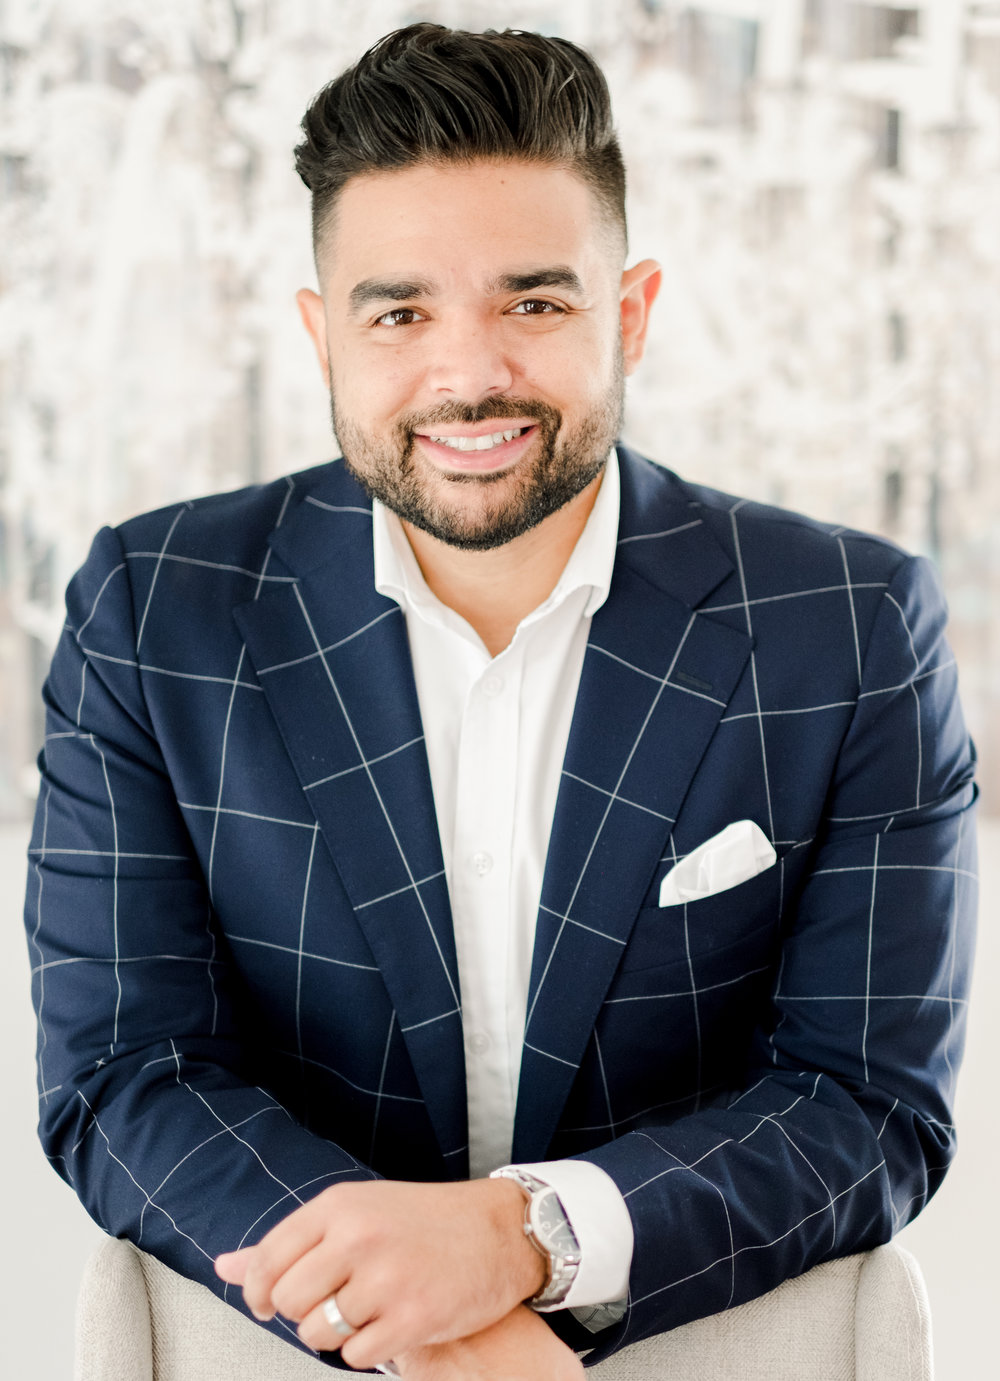 Ricardo Pena - Licensed Real Estate Salesperson, CBR